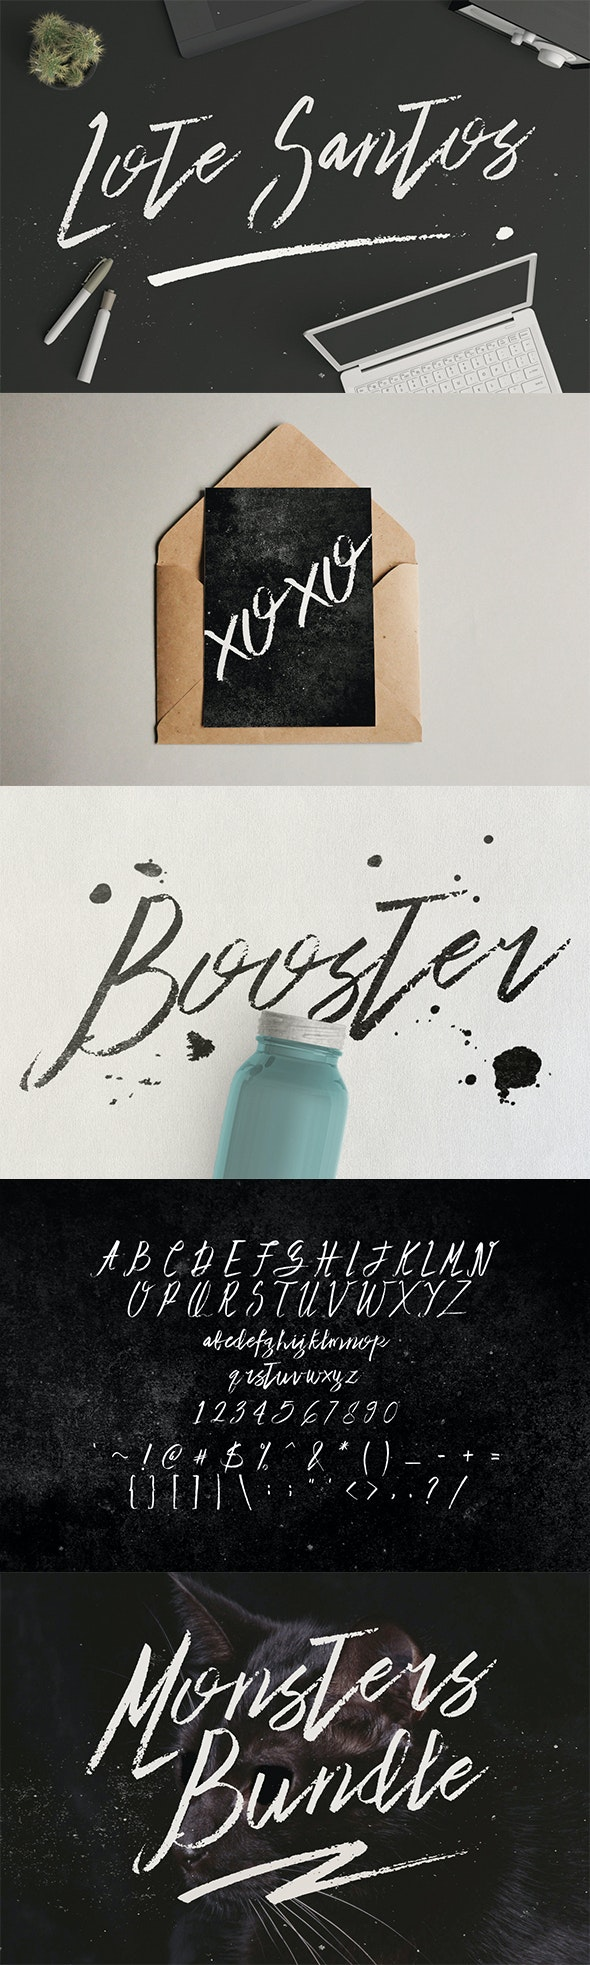 Lote Santos - Handwriting Fonts